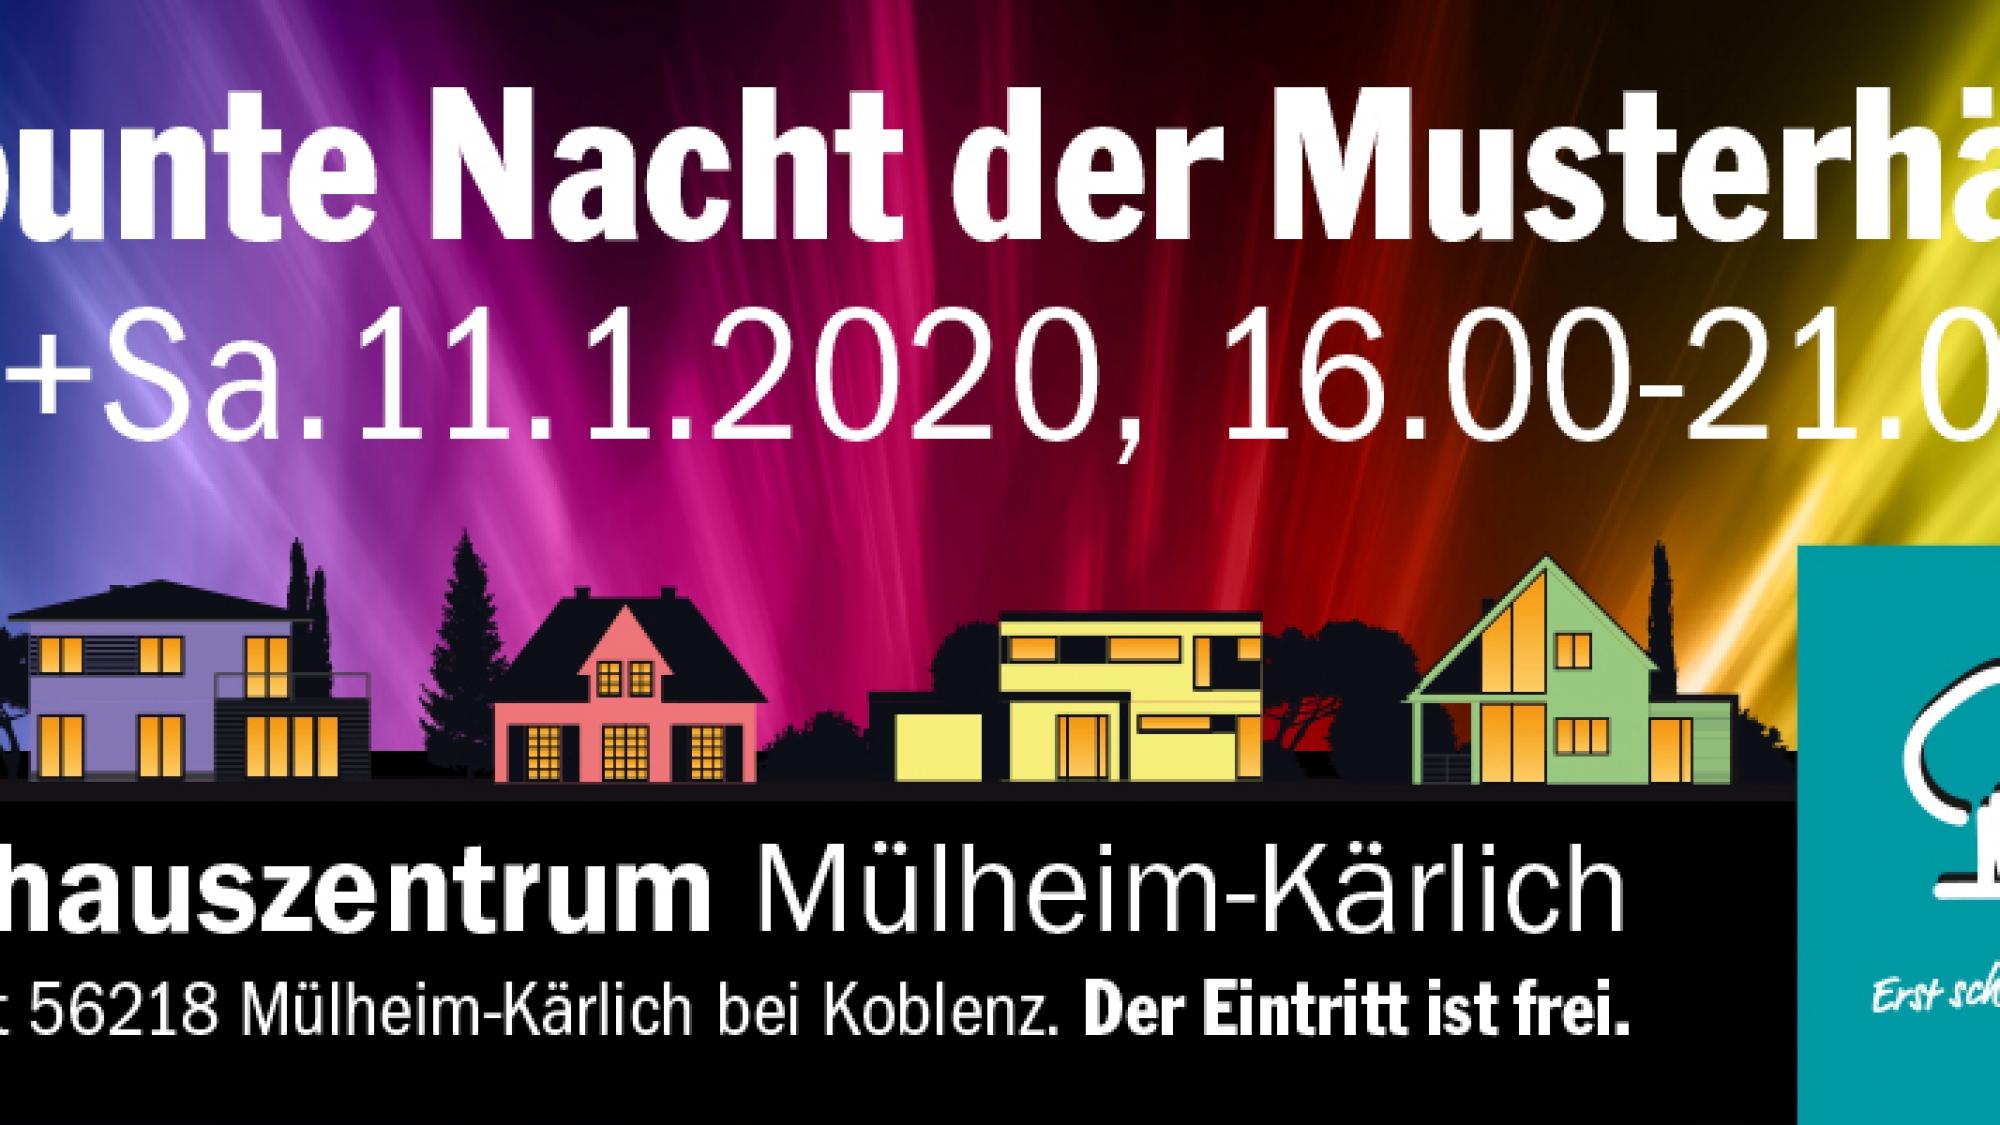 MHZ_IBAN_1947_1200x400_Musterhausnacht